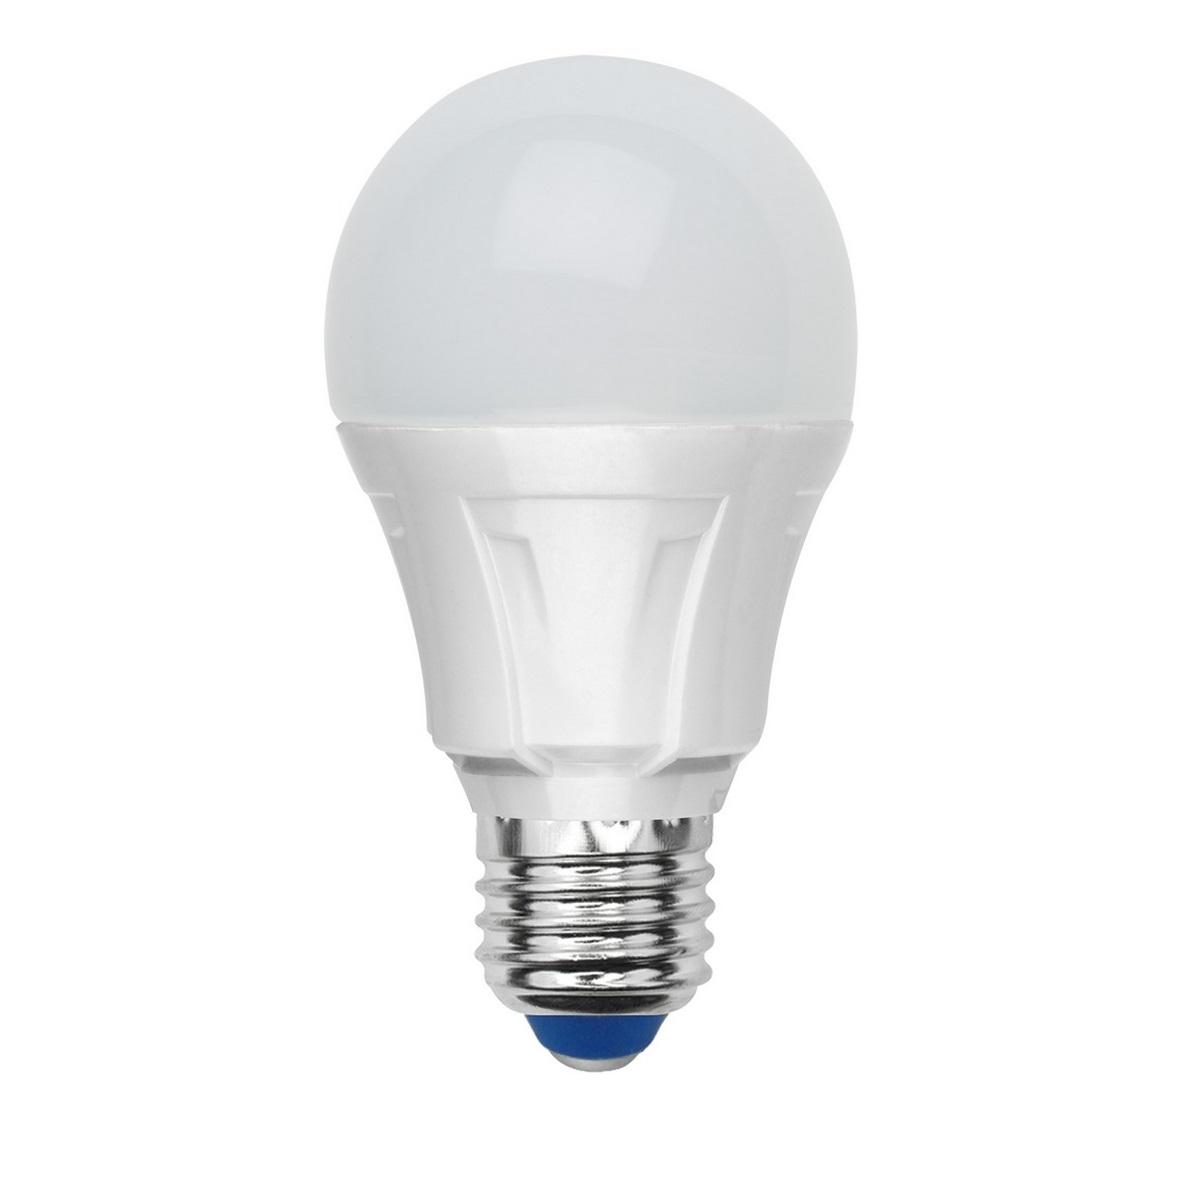 Лампа светодиодная Volpe Led-a60-11w/nw/e27/fr/s  (LED-A60-11W/NW/E27/FR/S картон)